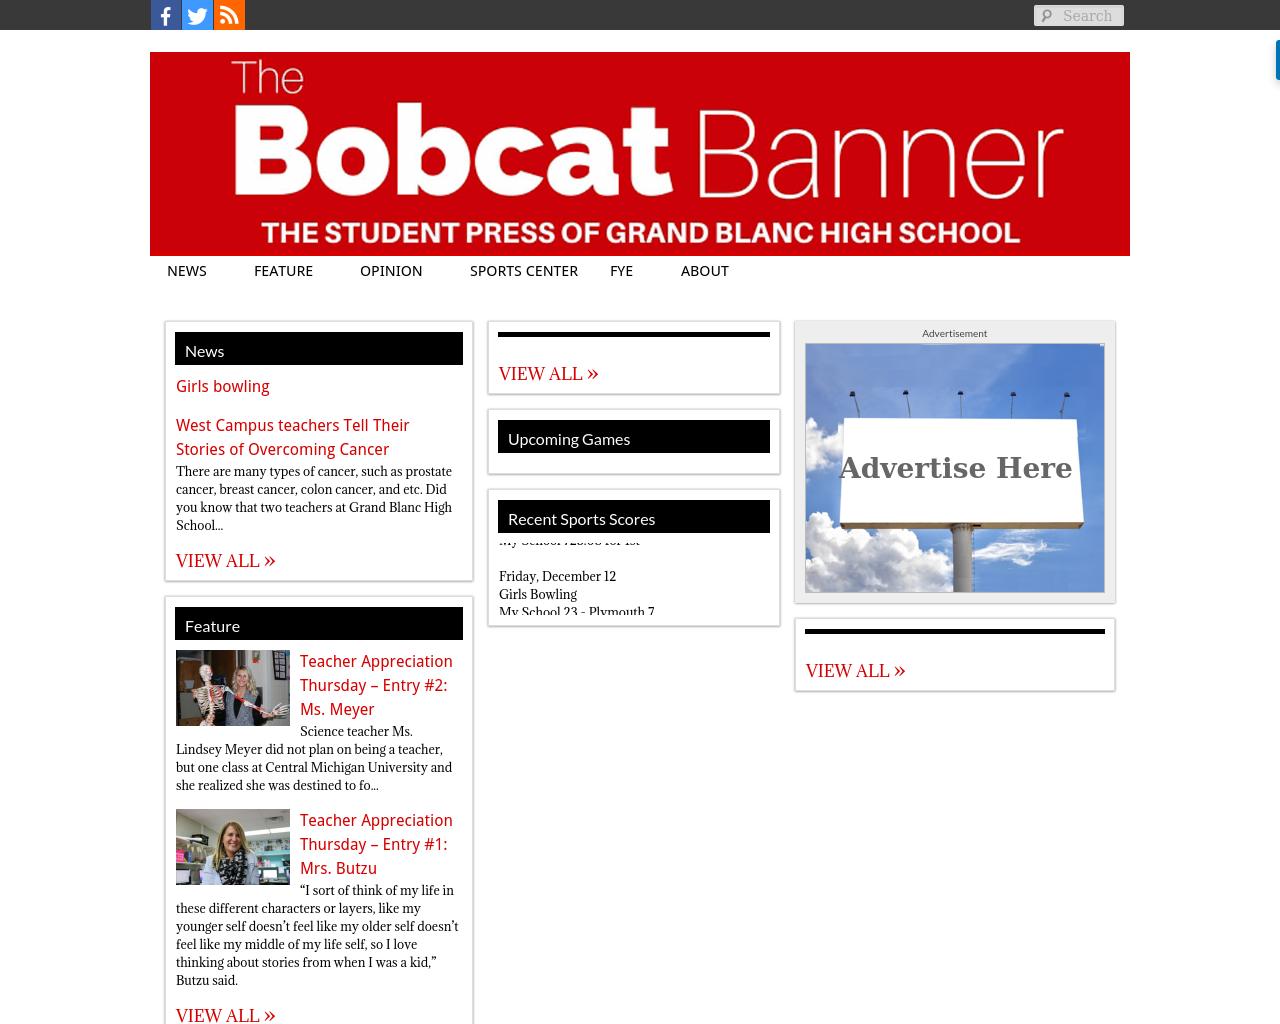 Bobcat-Banner-Advertising-Reviews-Pricing